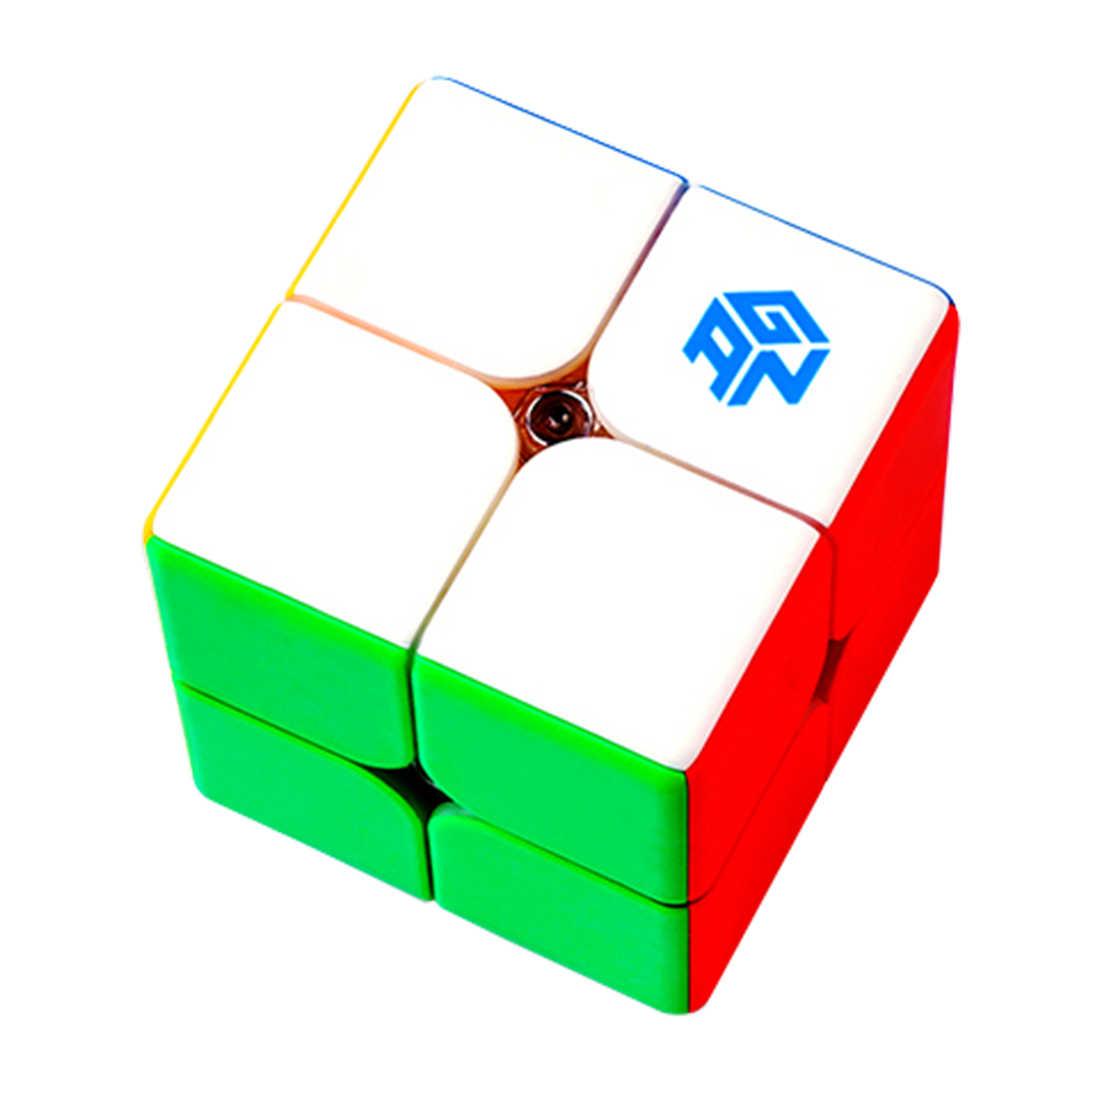 Ган 249 V2 M 249 м Магнитная Cube Stickerless Magic Cube 2x2x2 Скорость головоломки конкурс игрушка cubo WCA чемпионата 2x2 по магниты